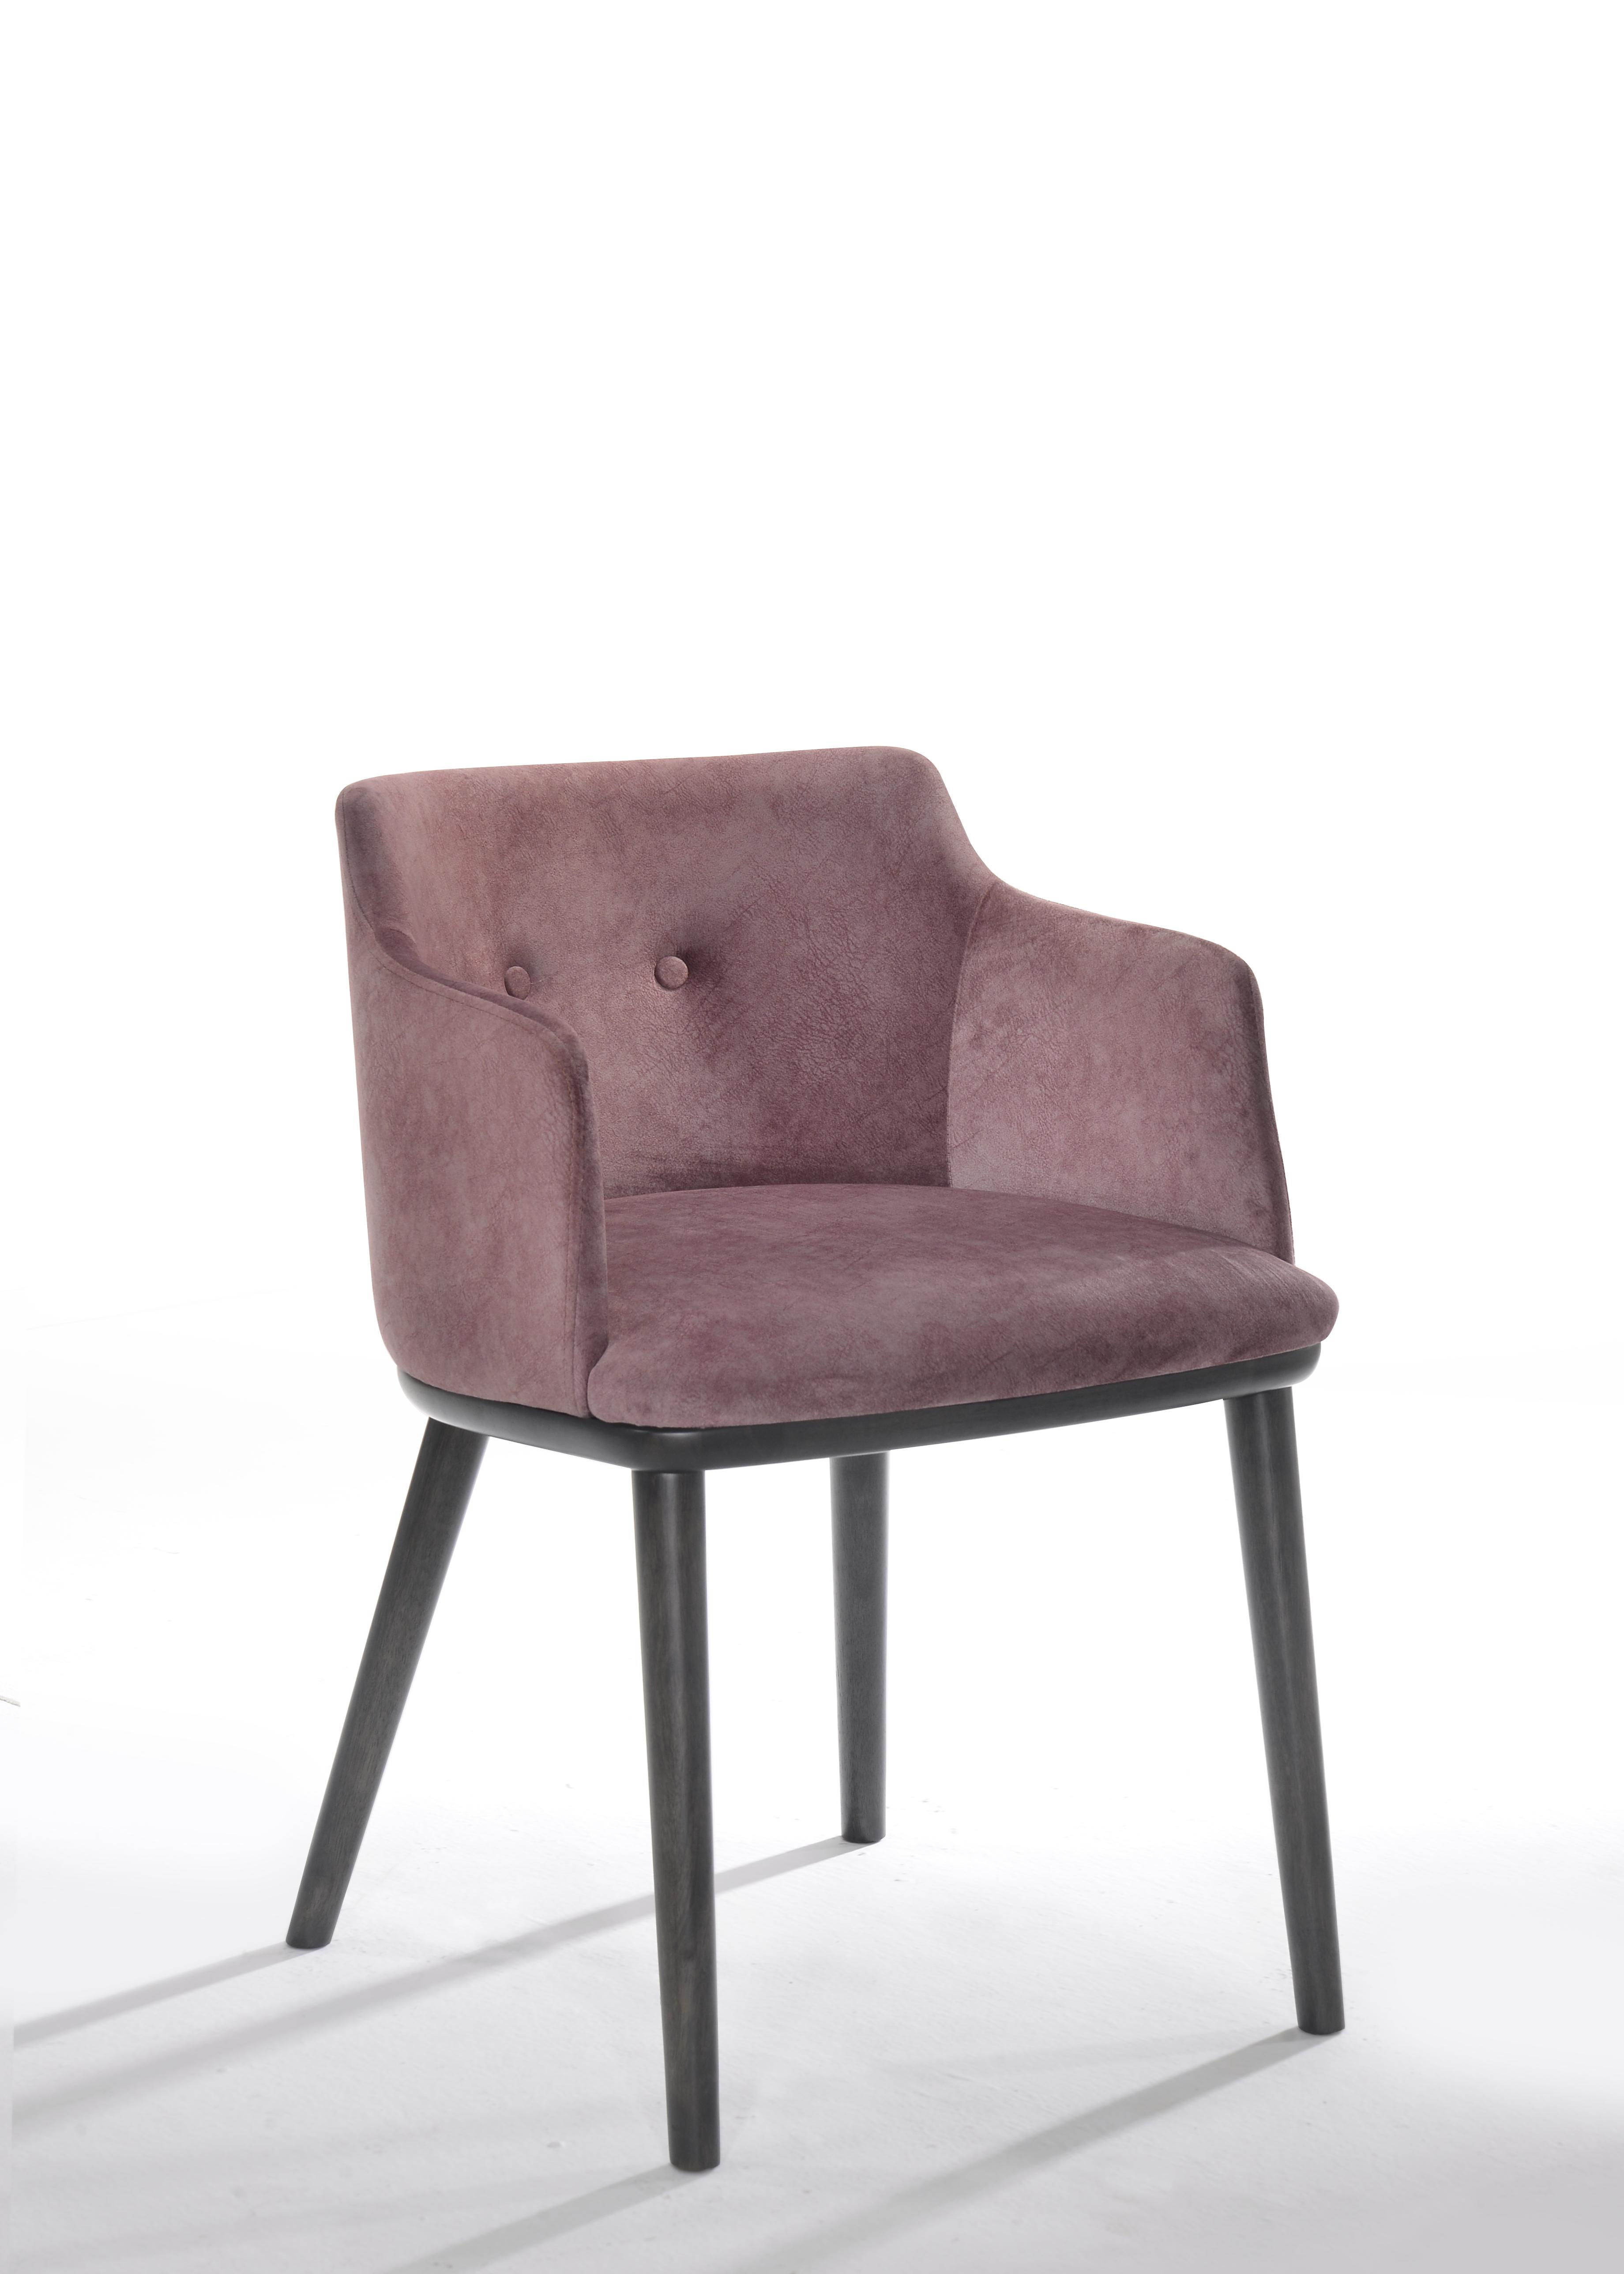 Mobiliya design - Stul -  Mİ-778  - 1